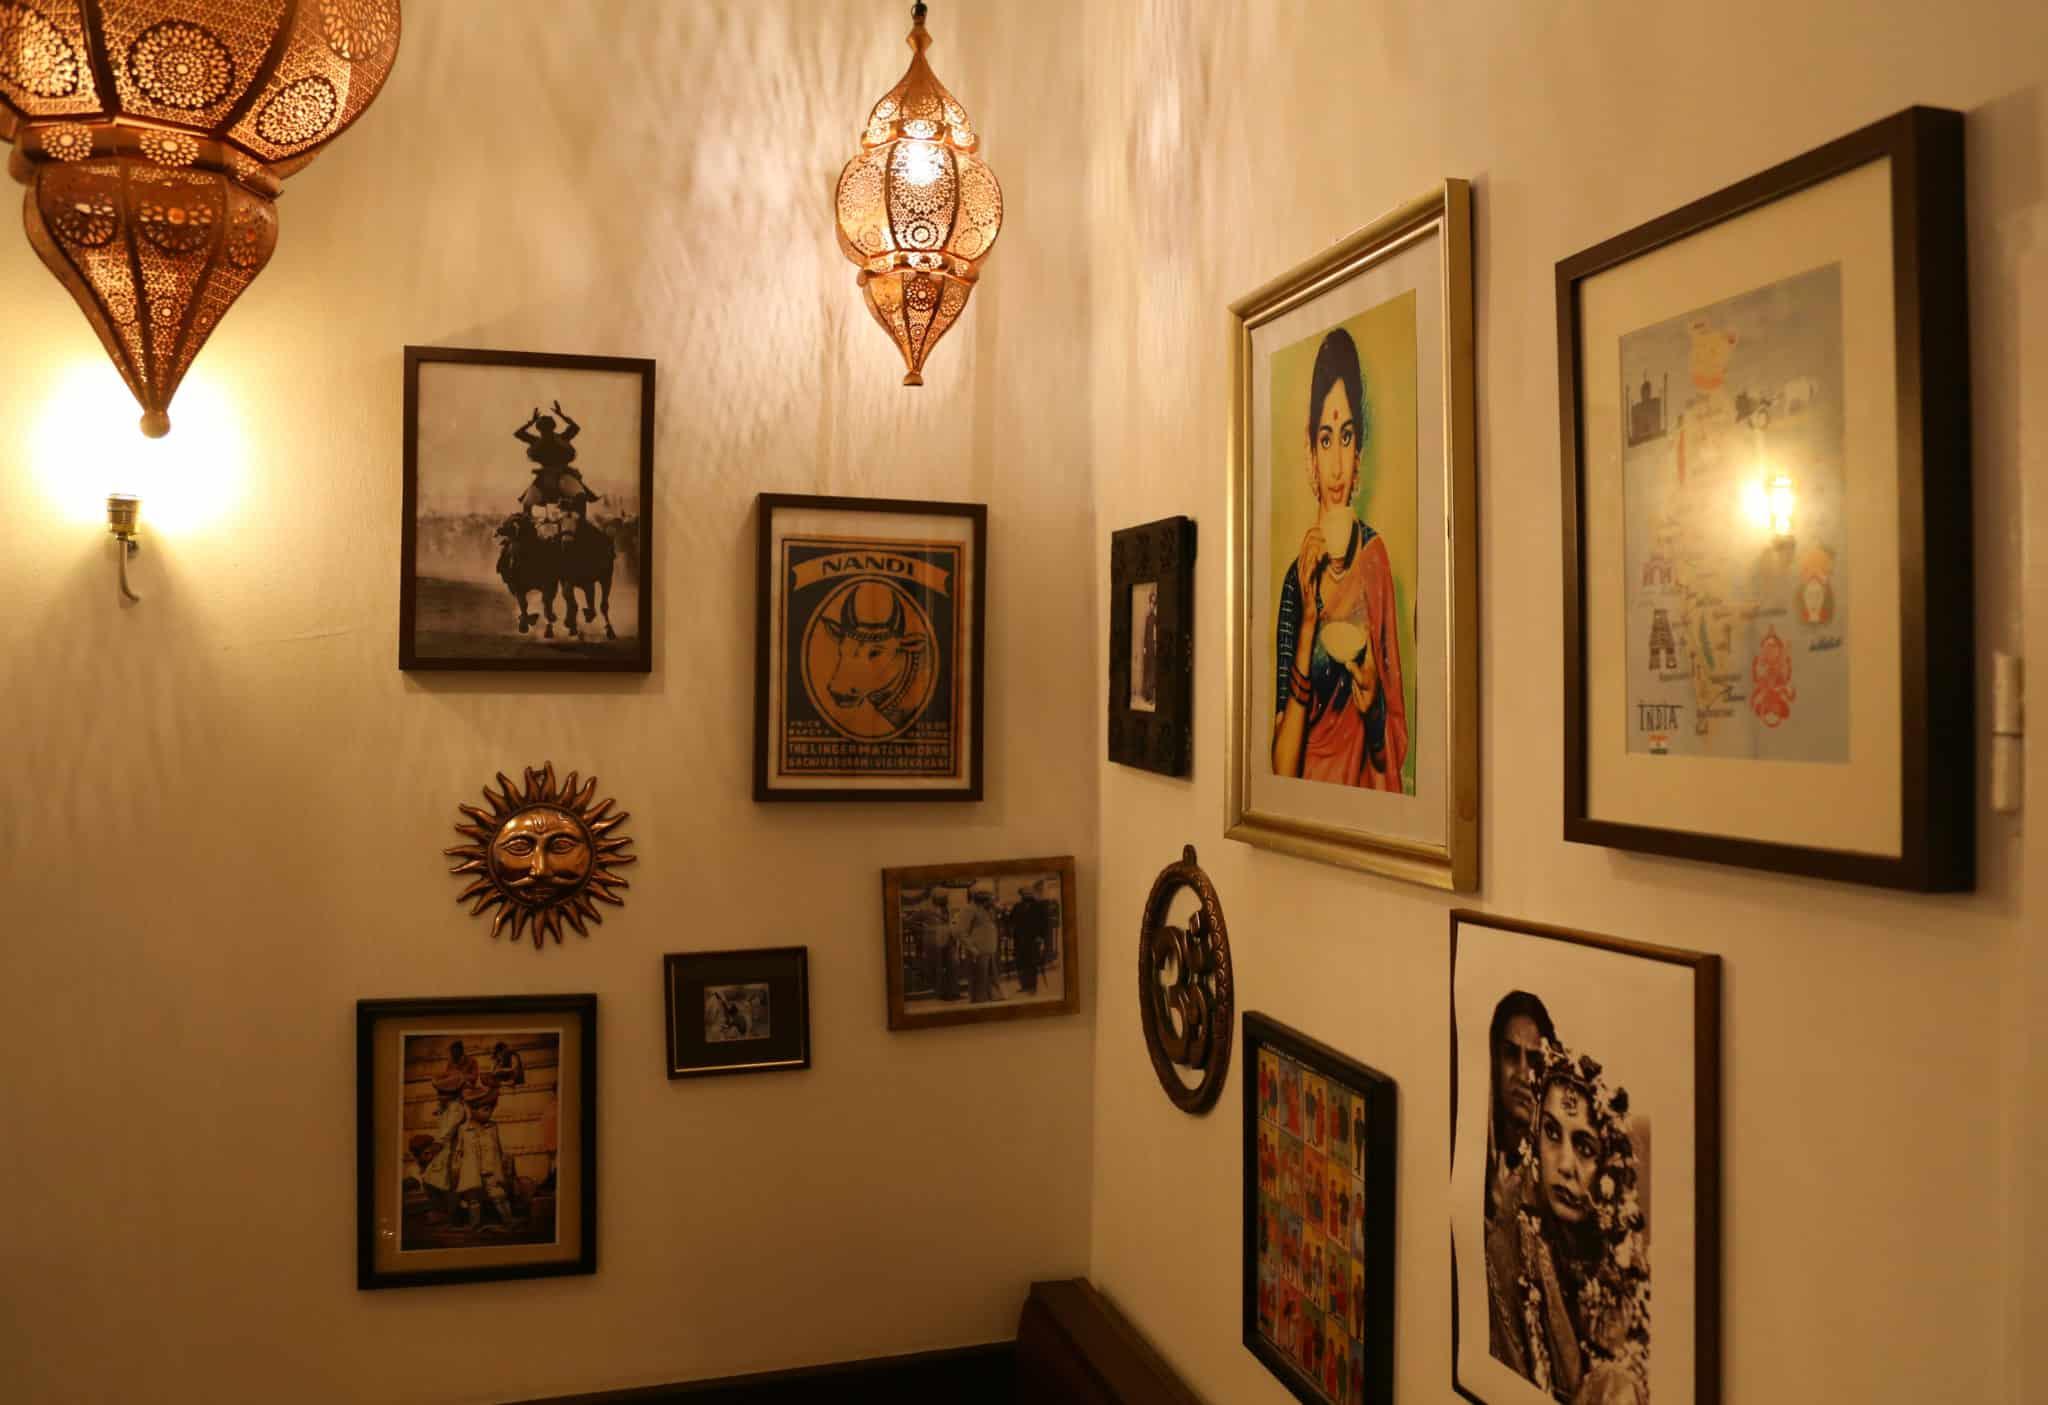 Berlin Loves You Bahadur indian restaurant